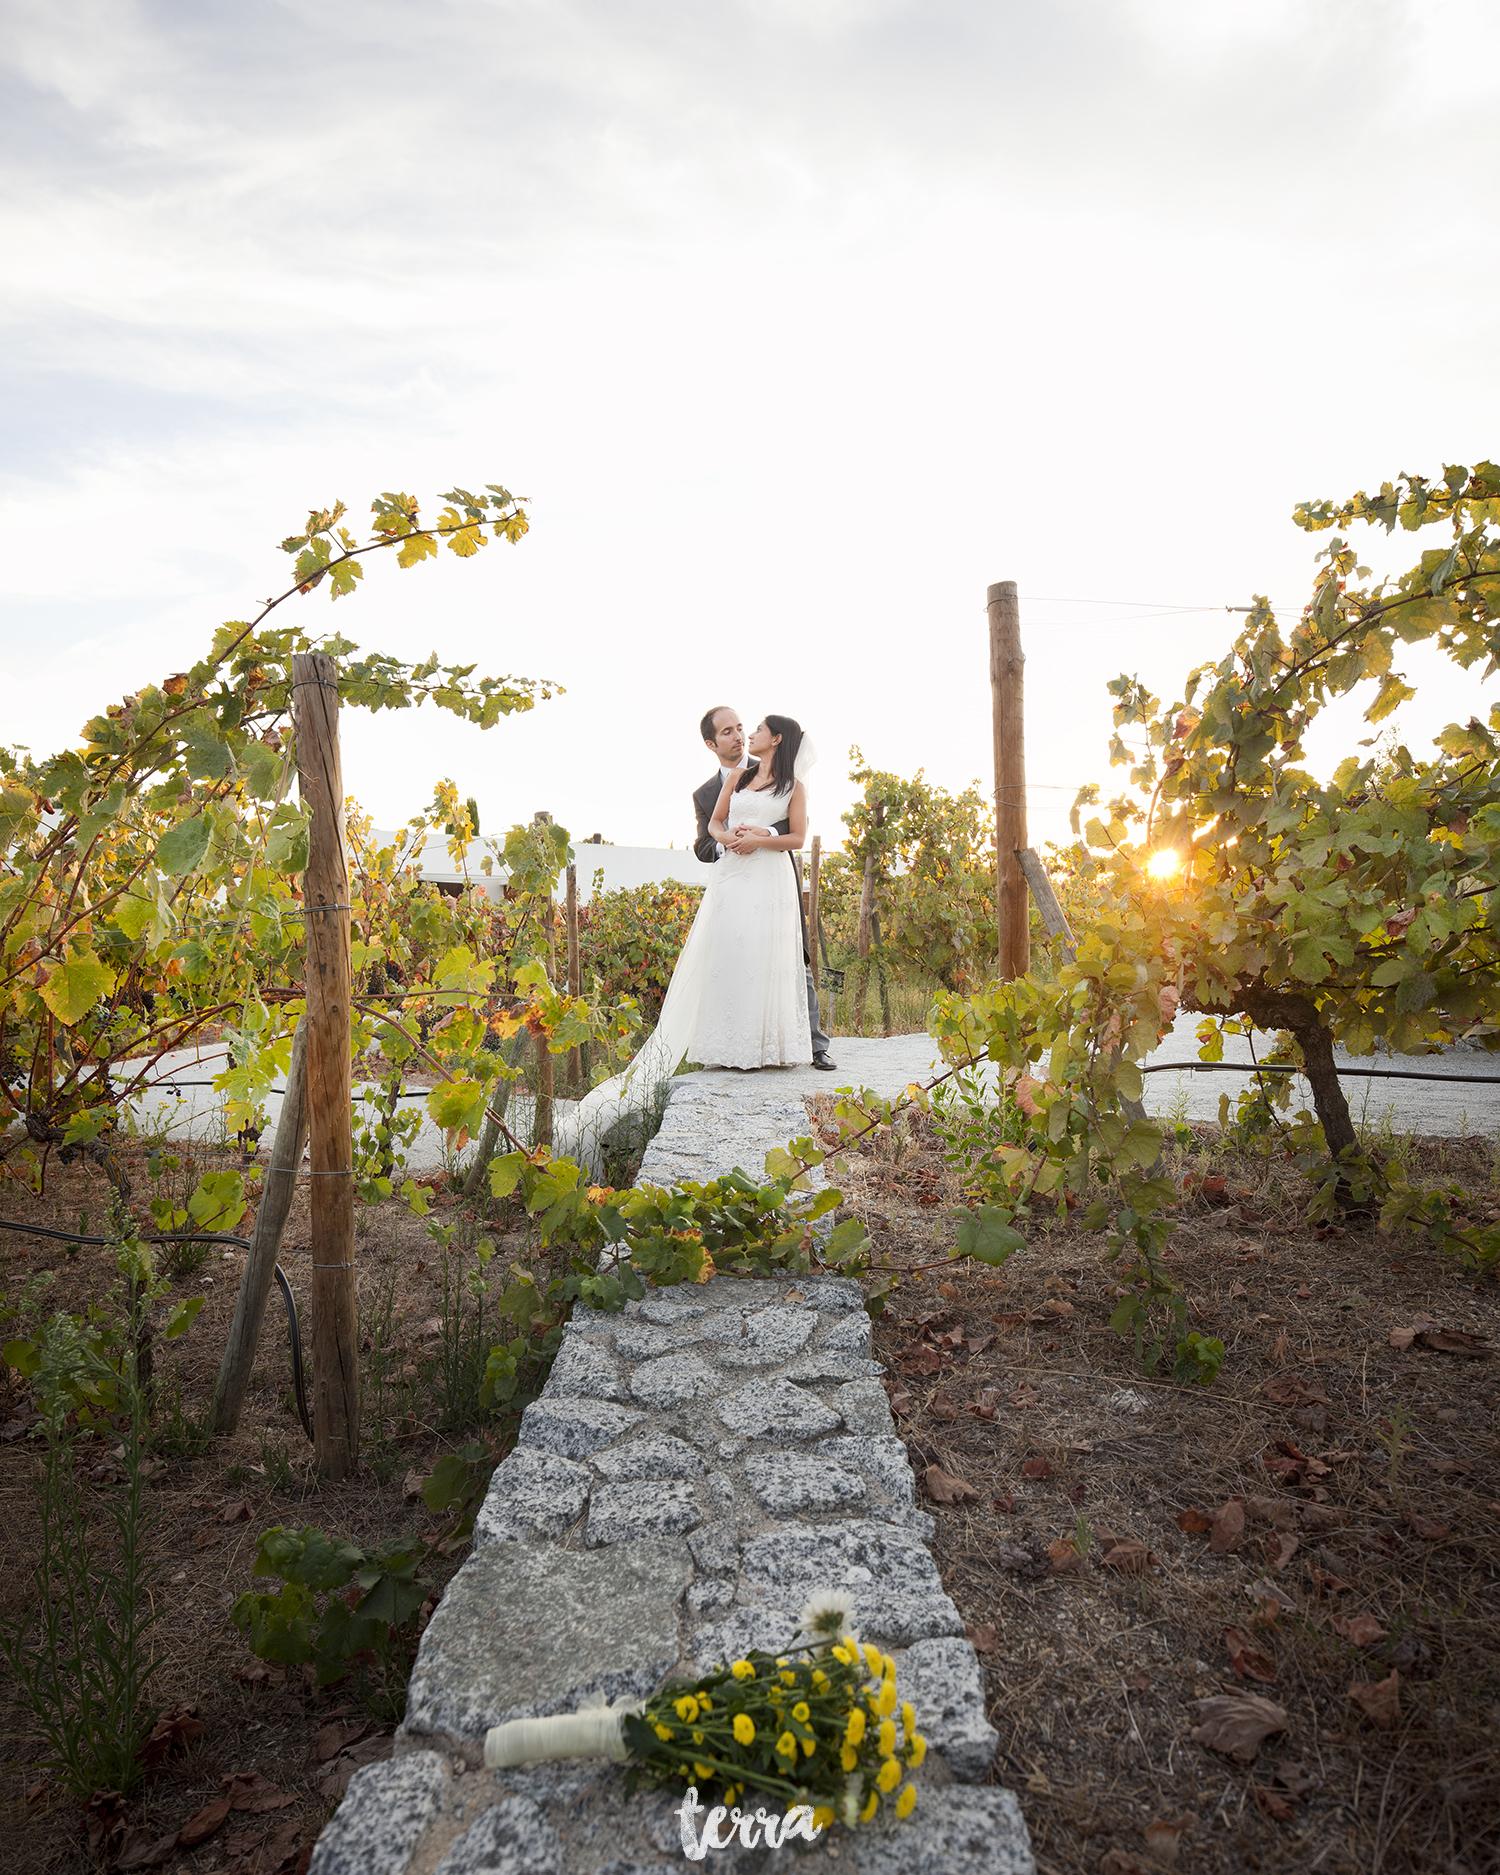 sessao-fotografica-trash-the-dress-land-vineyards-alentejo-terra-fotografia-0023.jpg